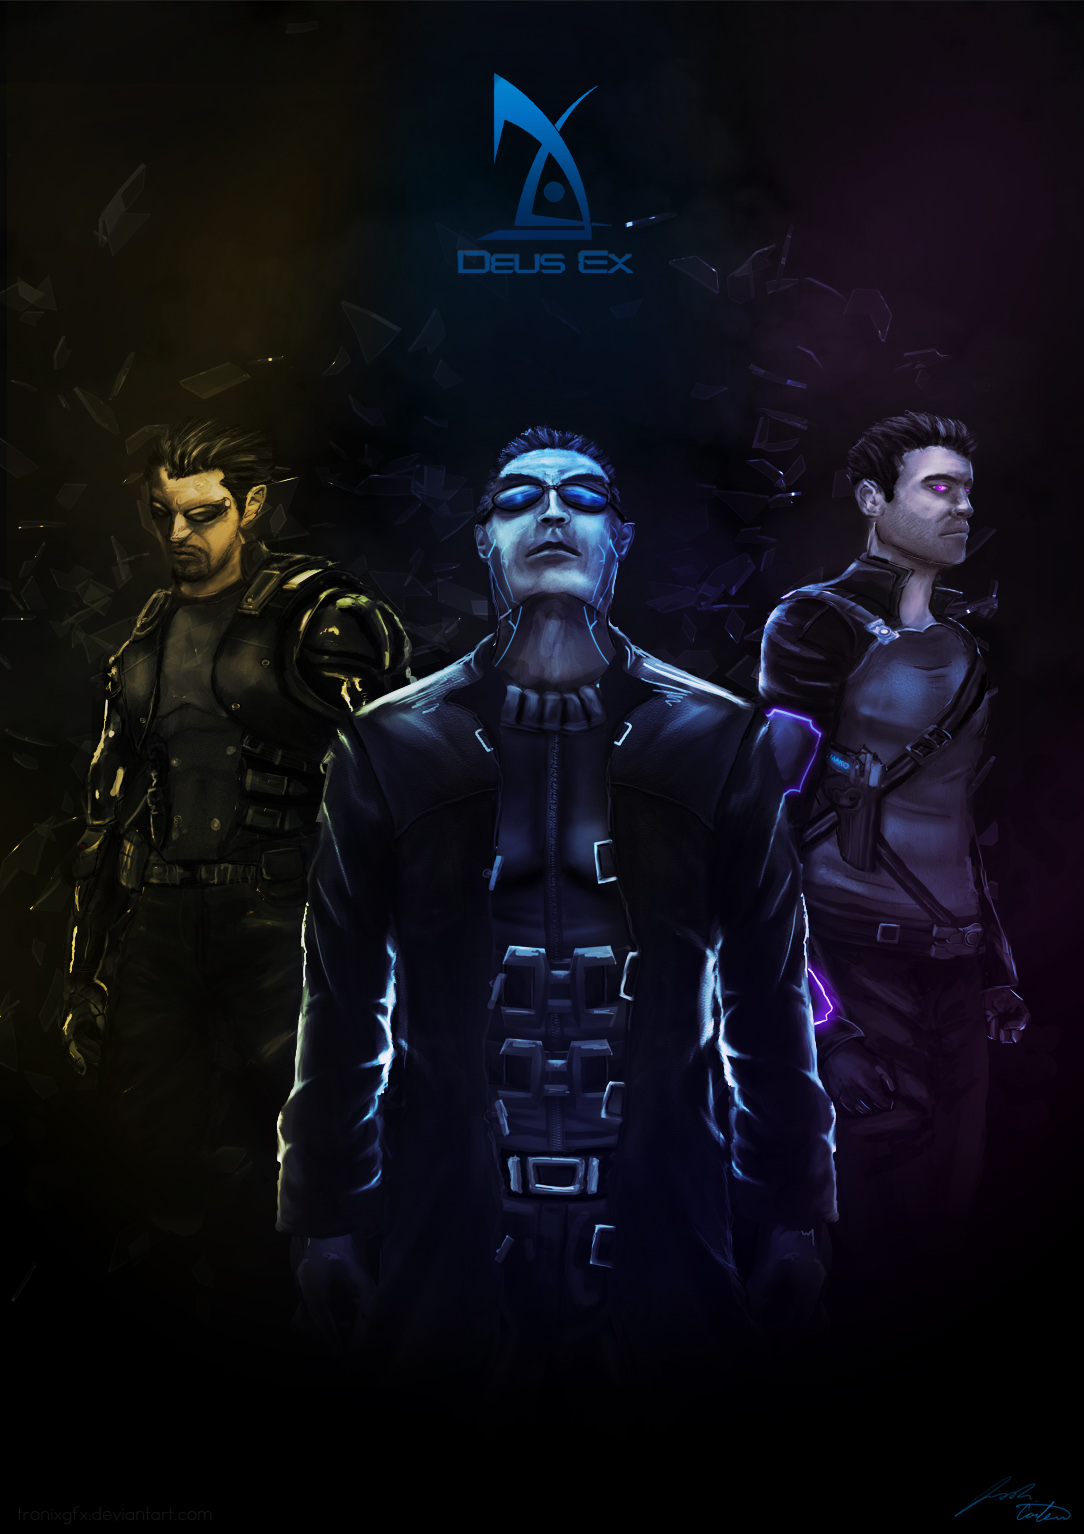 Deus Ex: Protagonists by TronixGFX